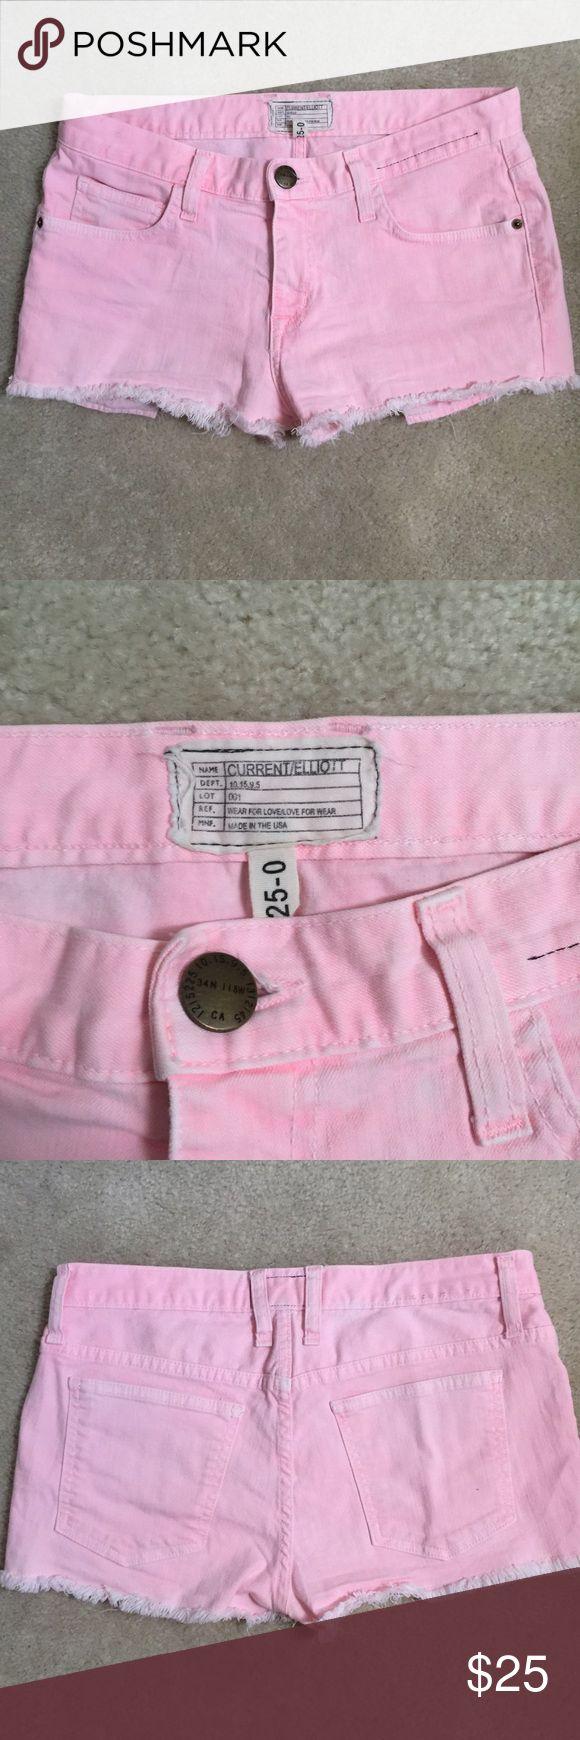 Current/Elliot boyfriend shorts in day glow pink Current/Elliot boyfriend short in day glow pink 98% cotton 2% elastin Only worn once. Current/Elliott Shorts Jean Shorts